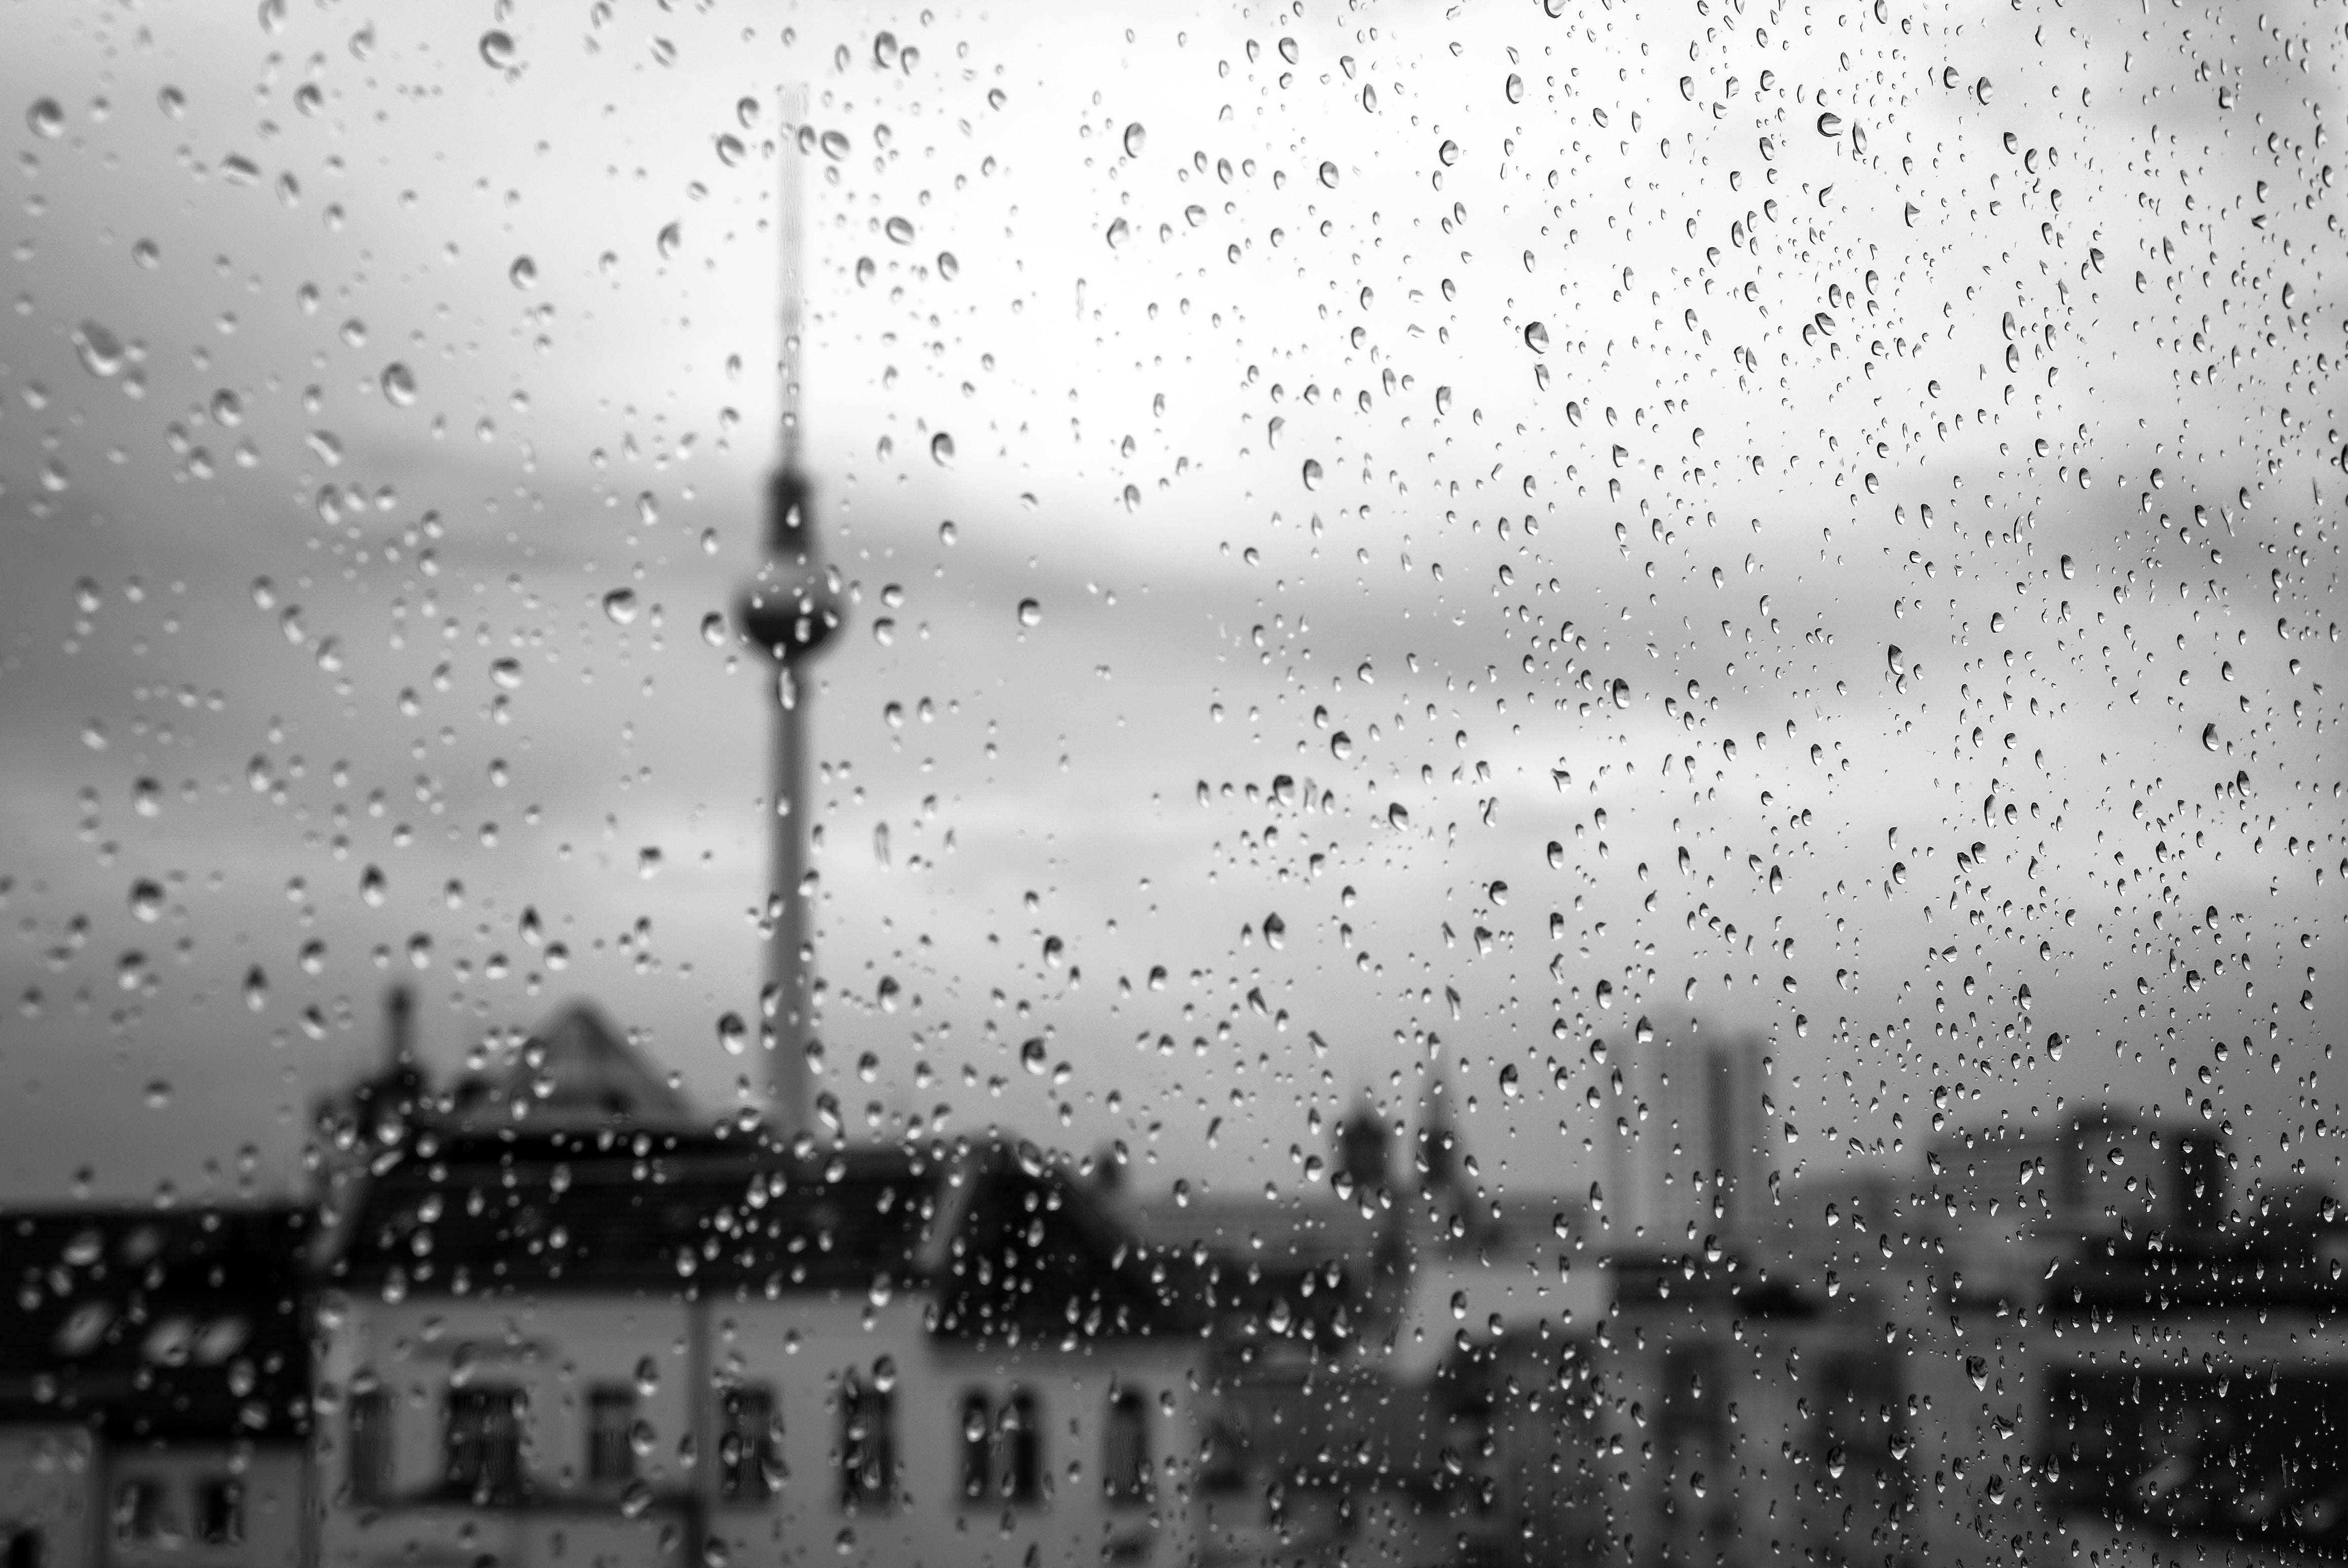 water drops on clear glass window